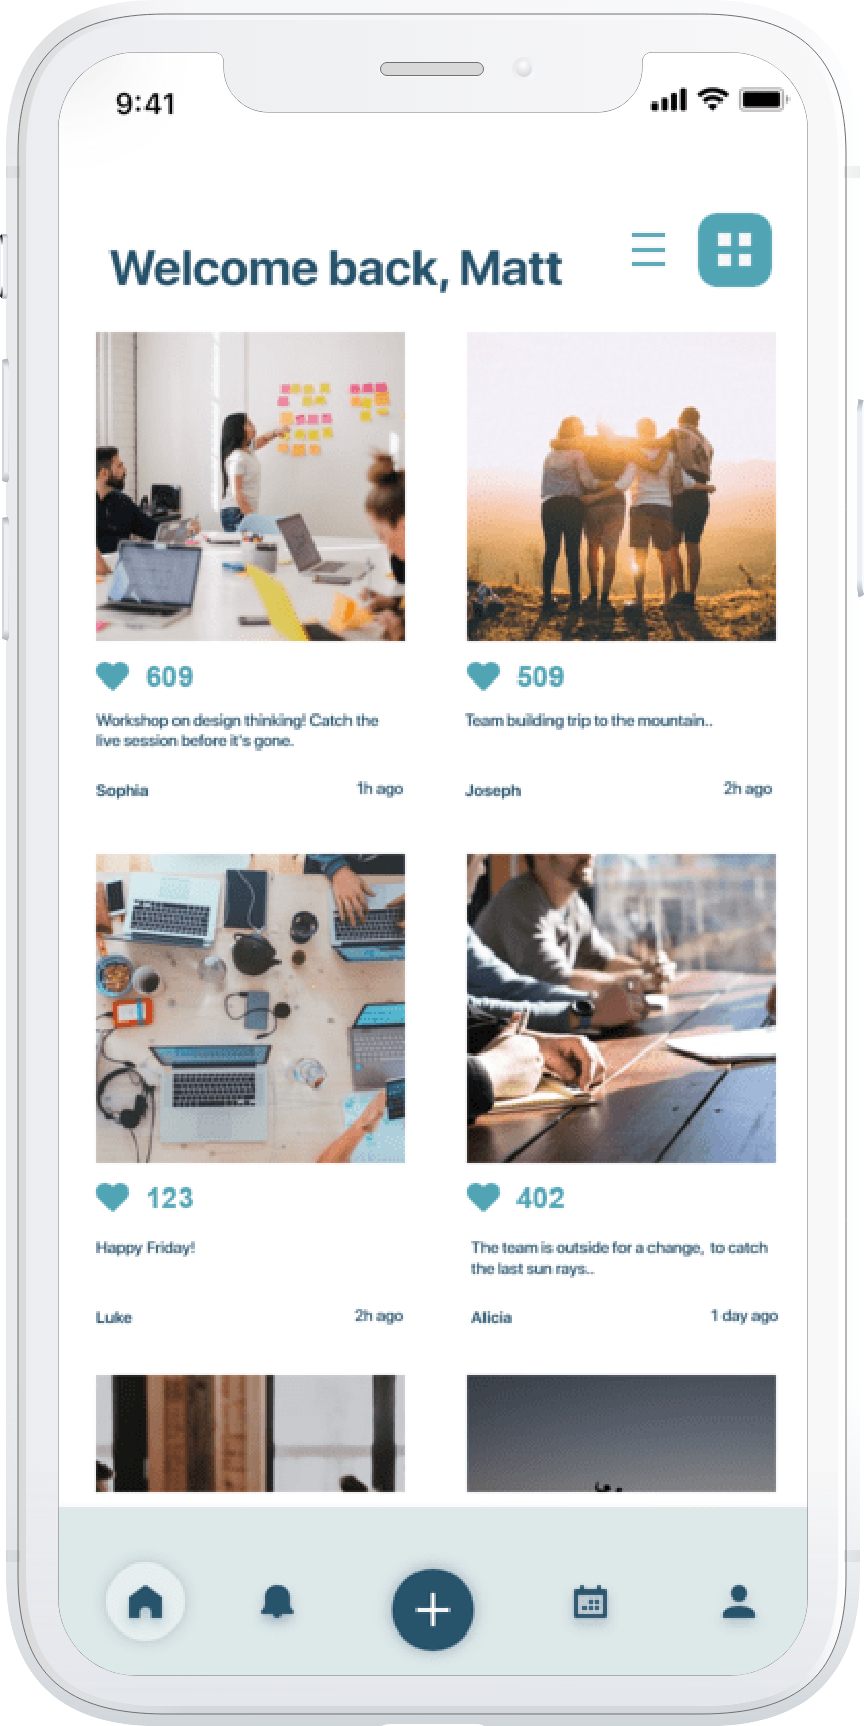 ContentCollect-Social-Media-App-Mockups-02